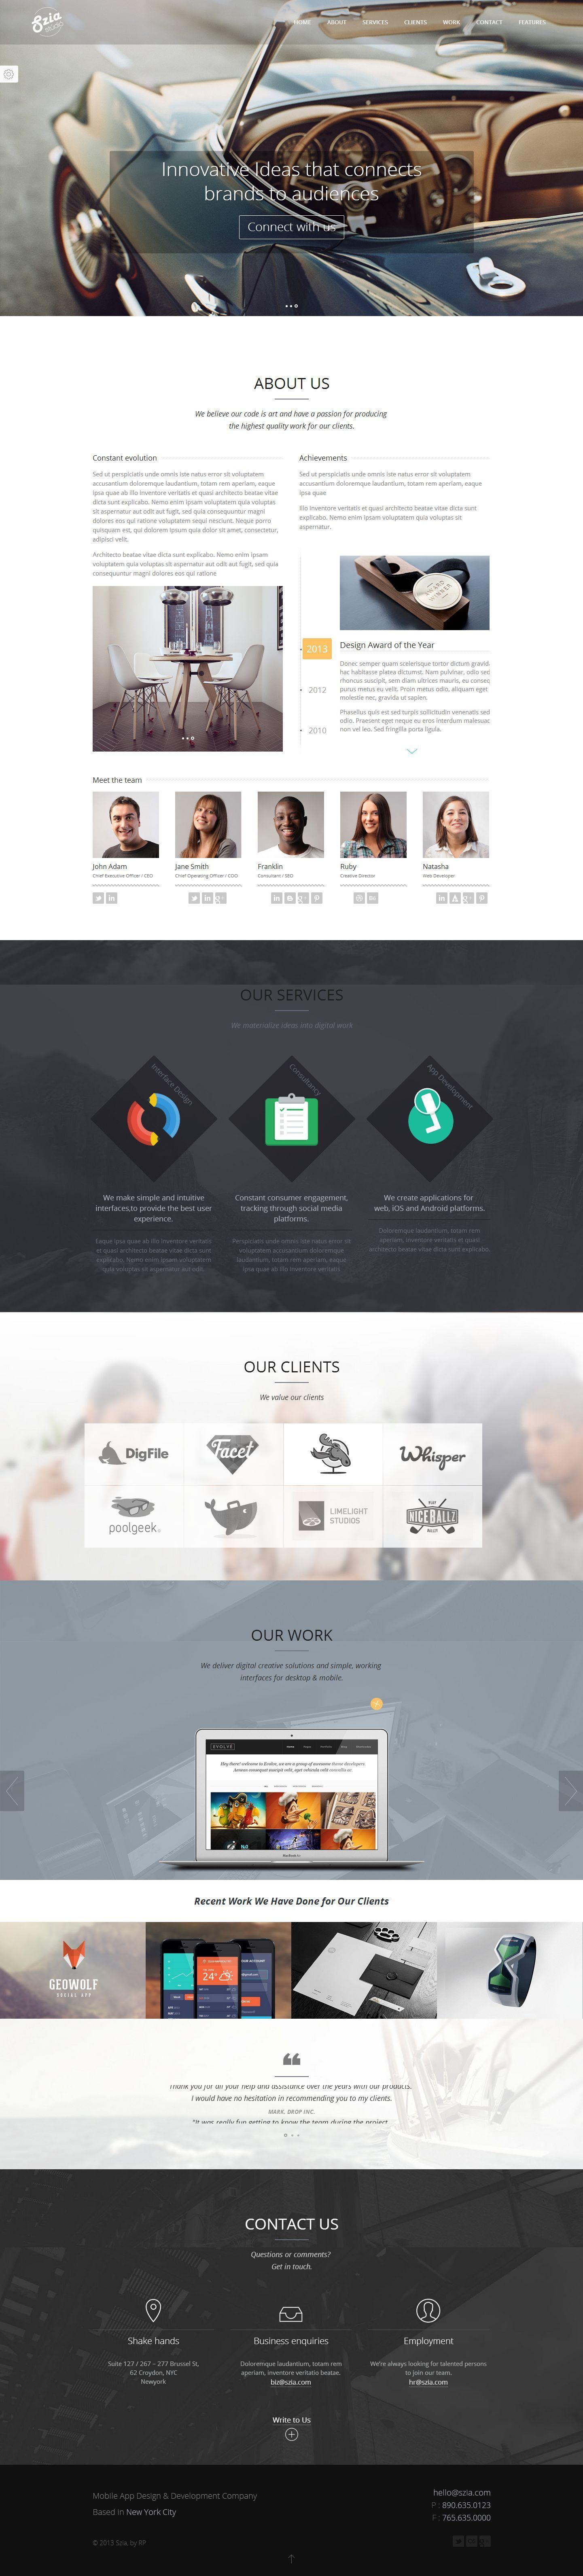 Szia - Responsive One Page Portfolio